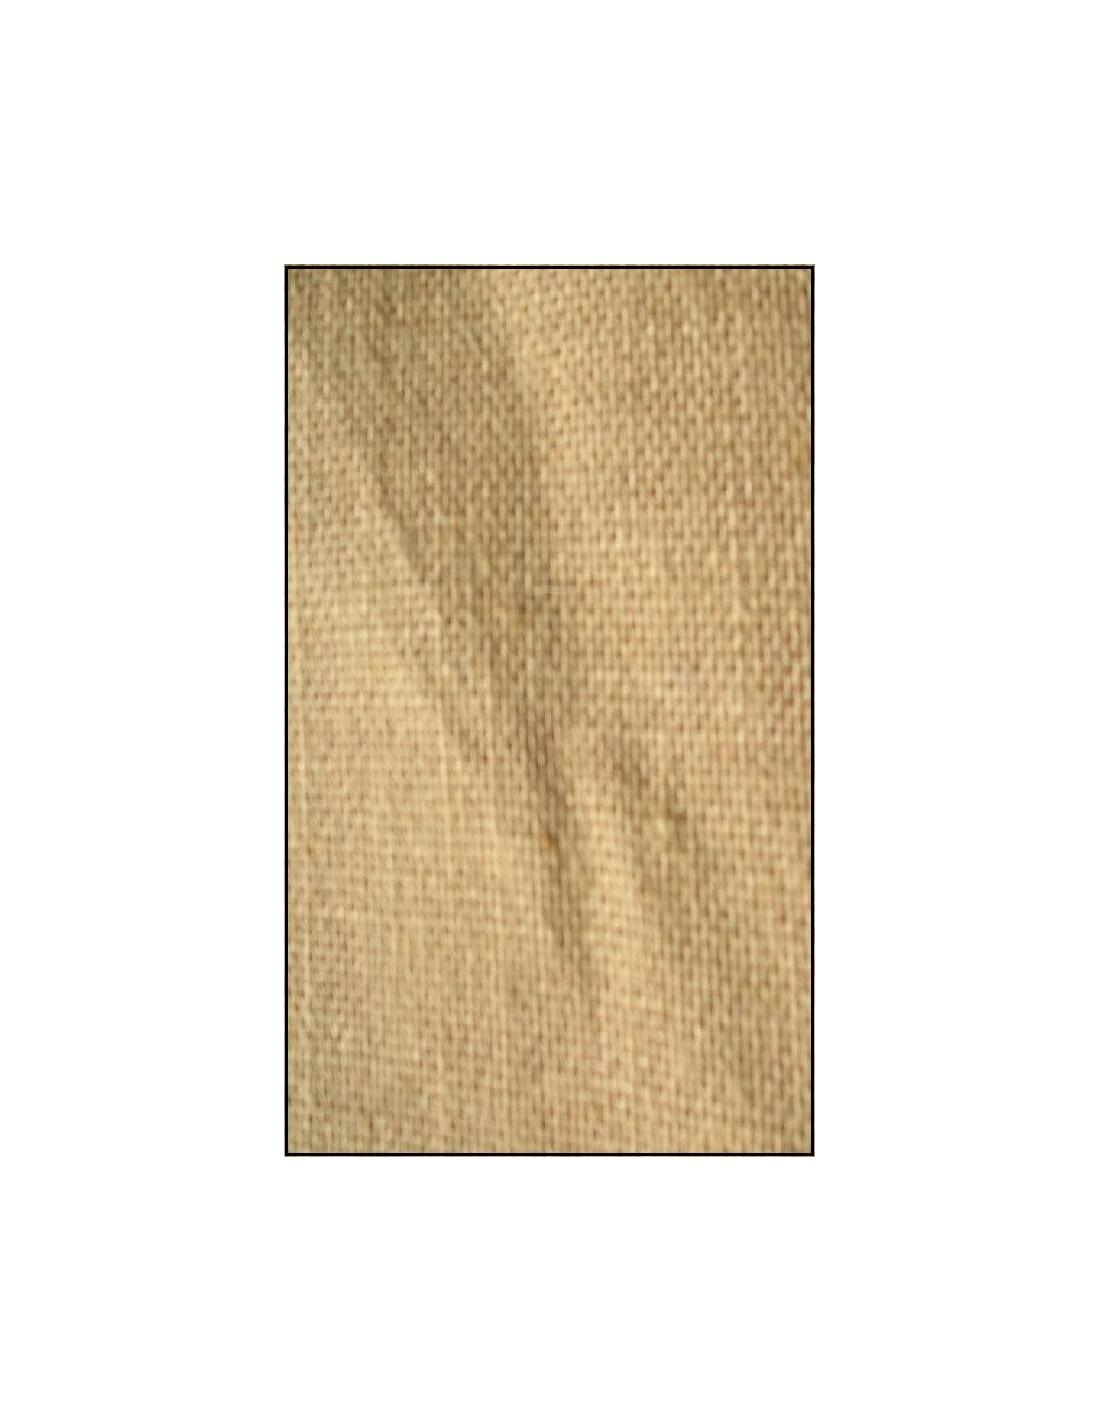 Jute vert anis jute naturel jute rouge toile de jute toile broder sac patates - Toile a canevas pour tapis ...